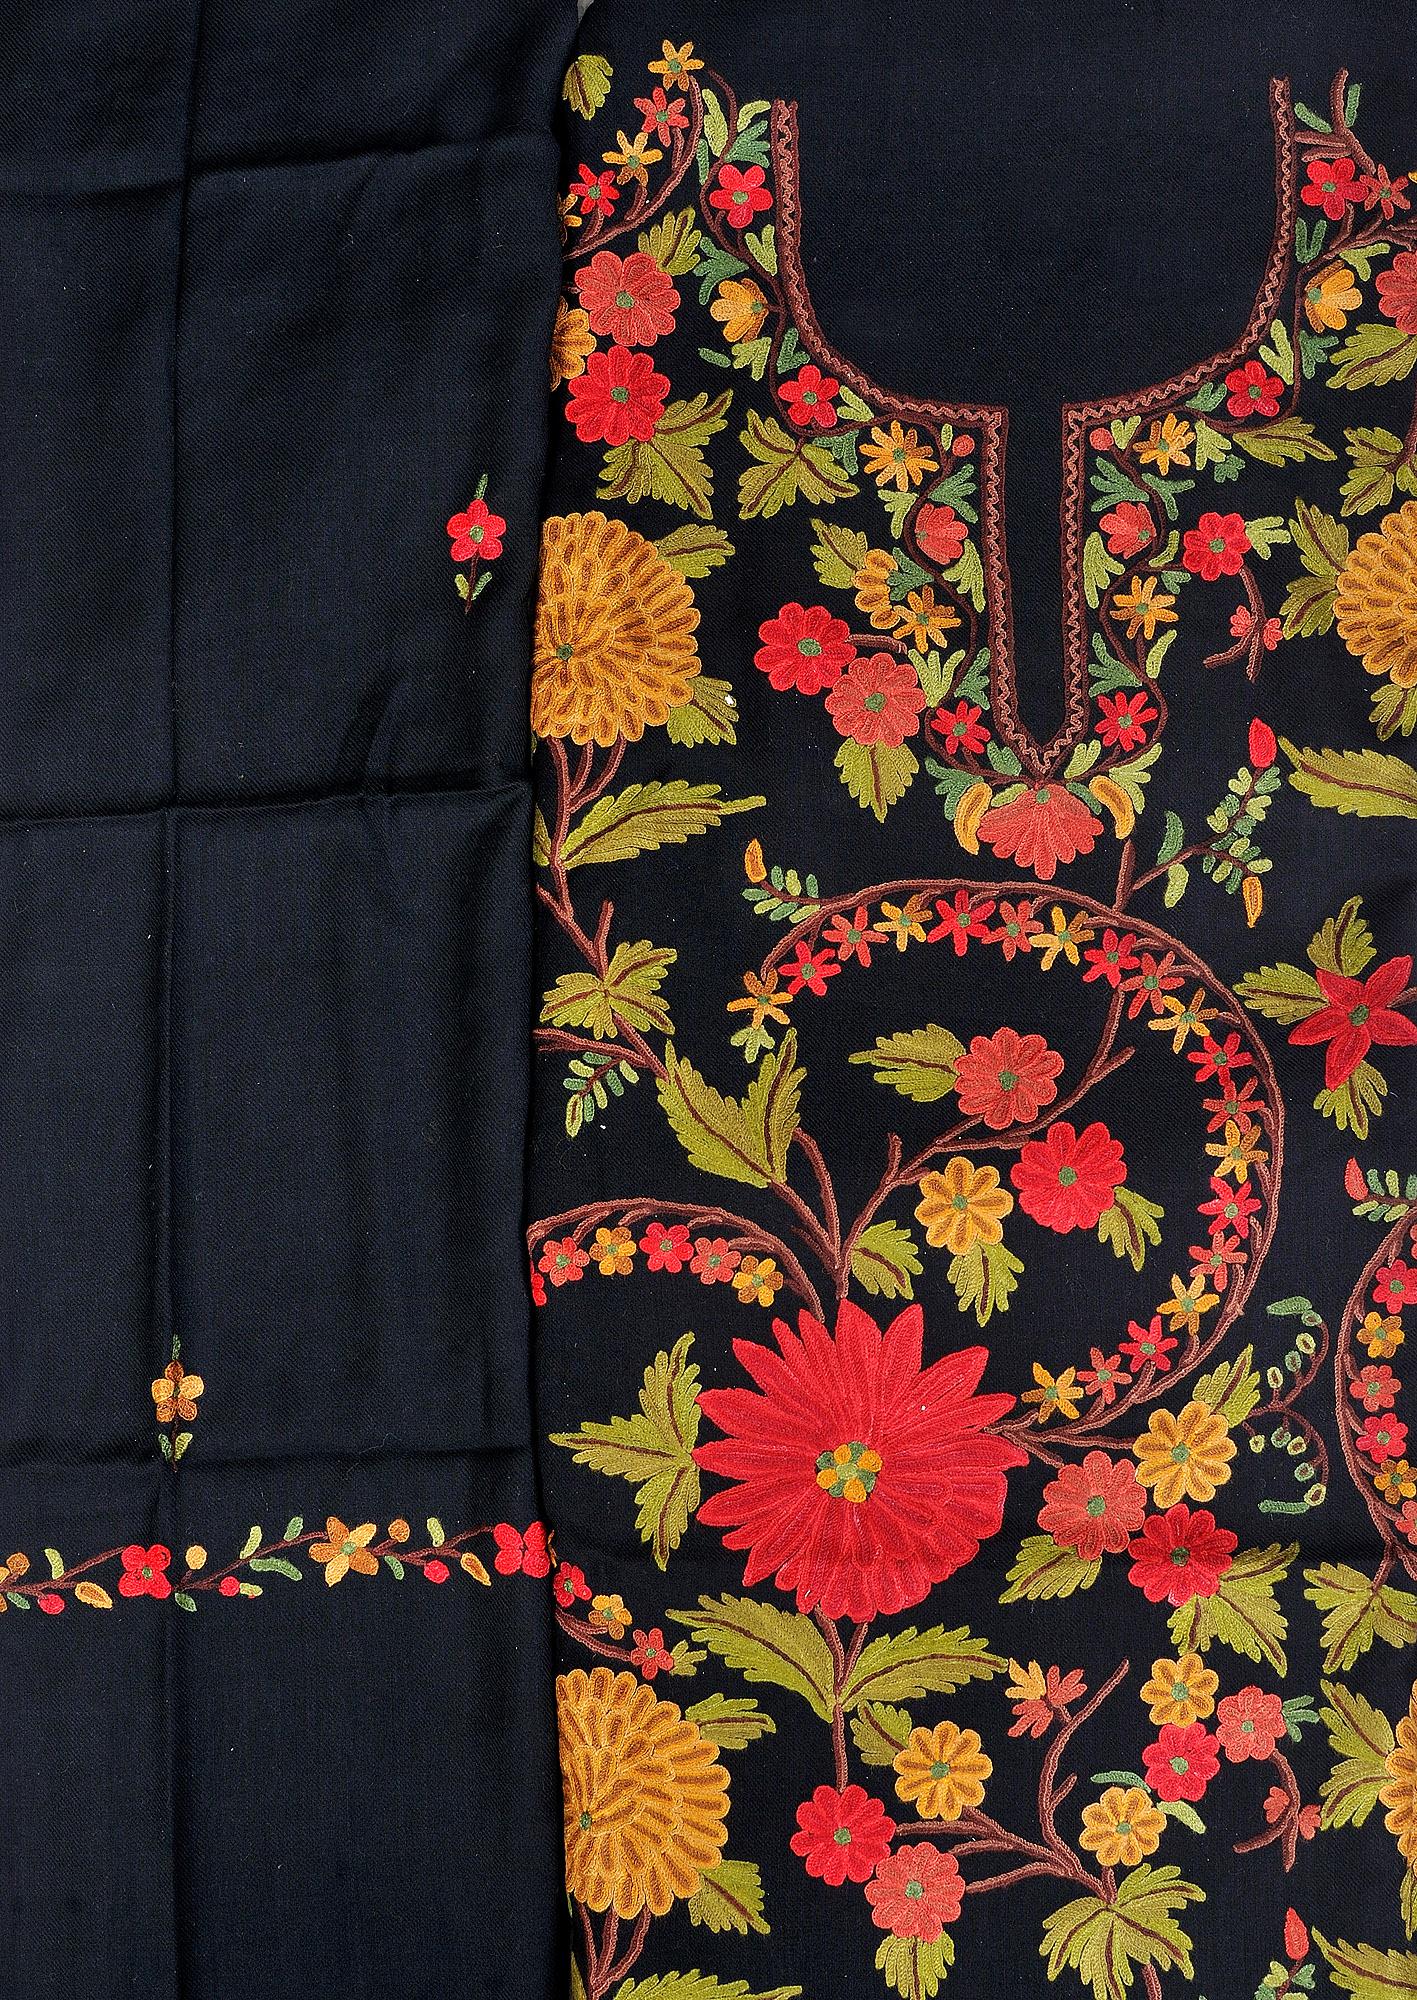 Jet black salwar kameez fabric from kashmir with ari hand